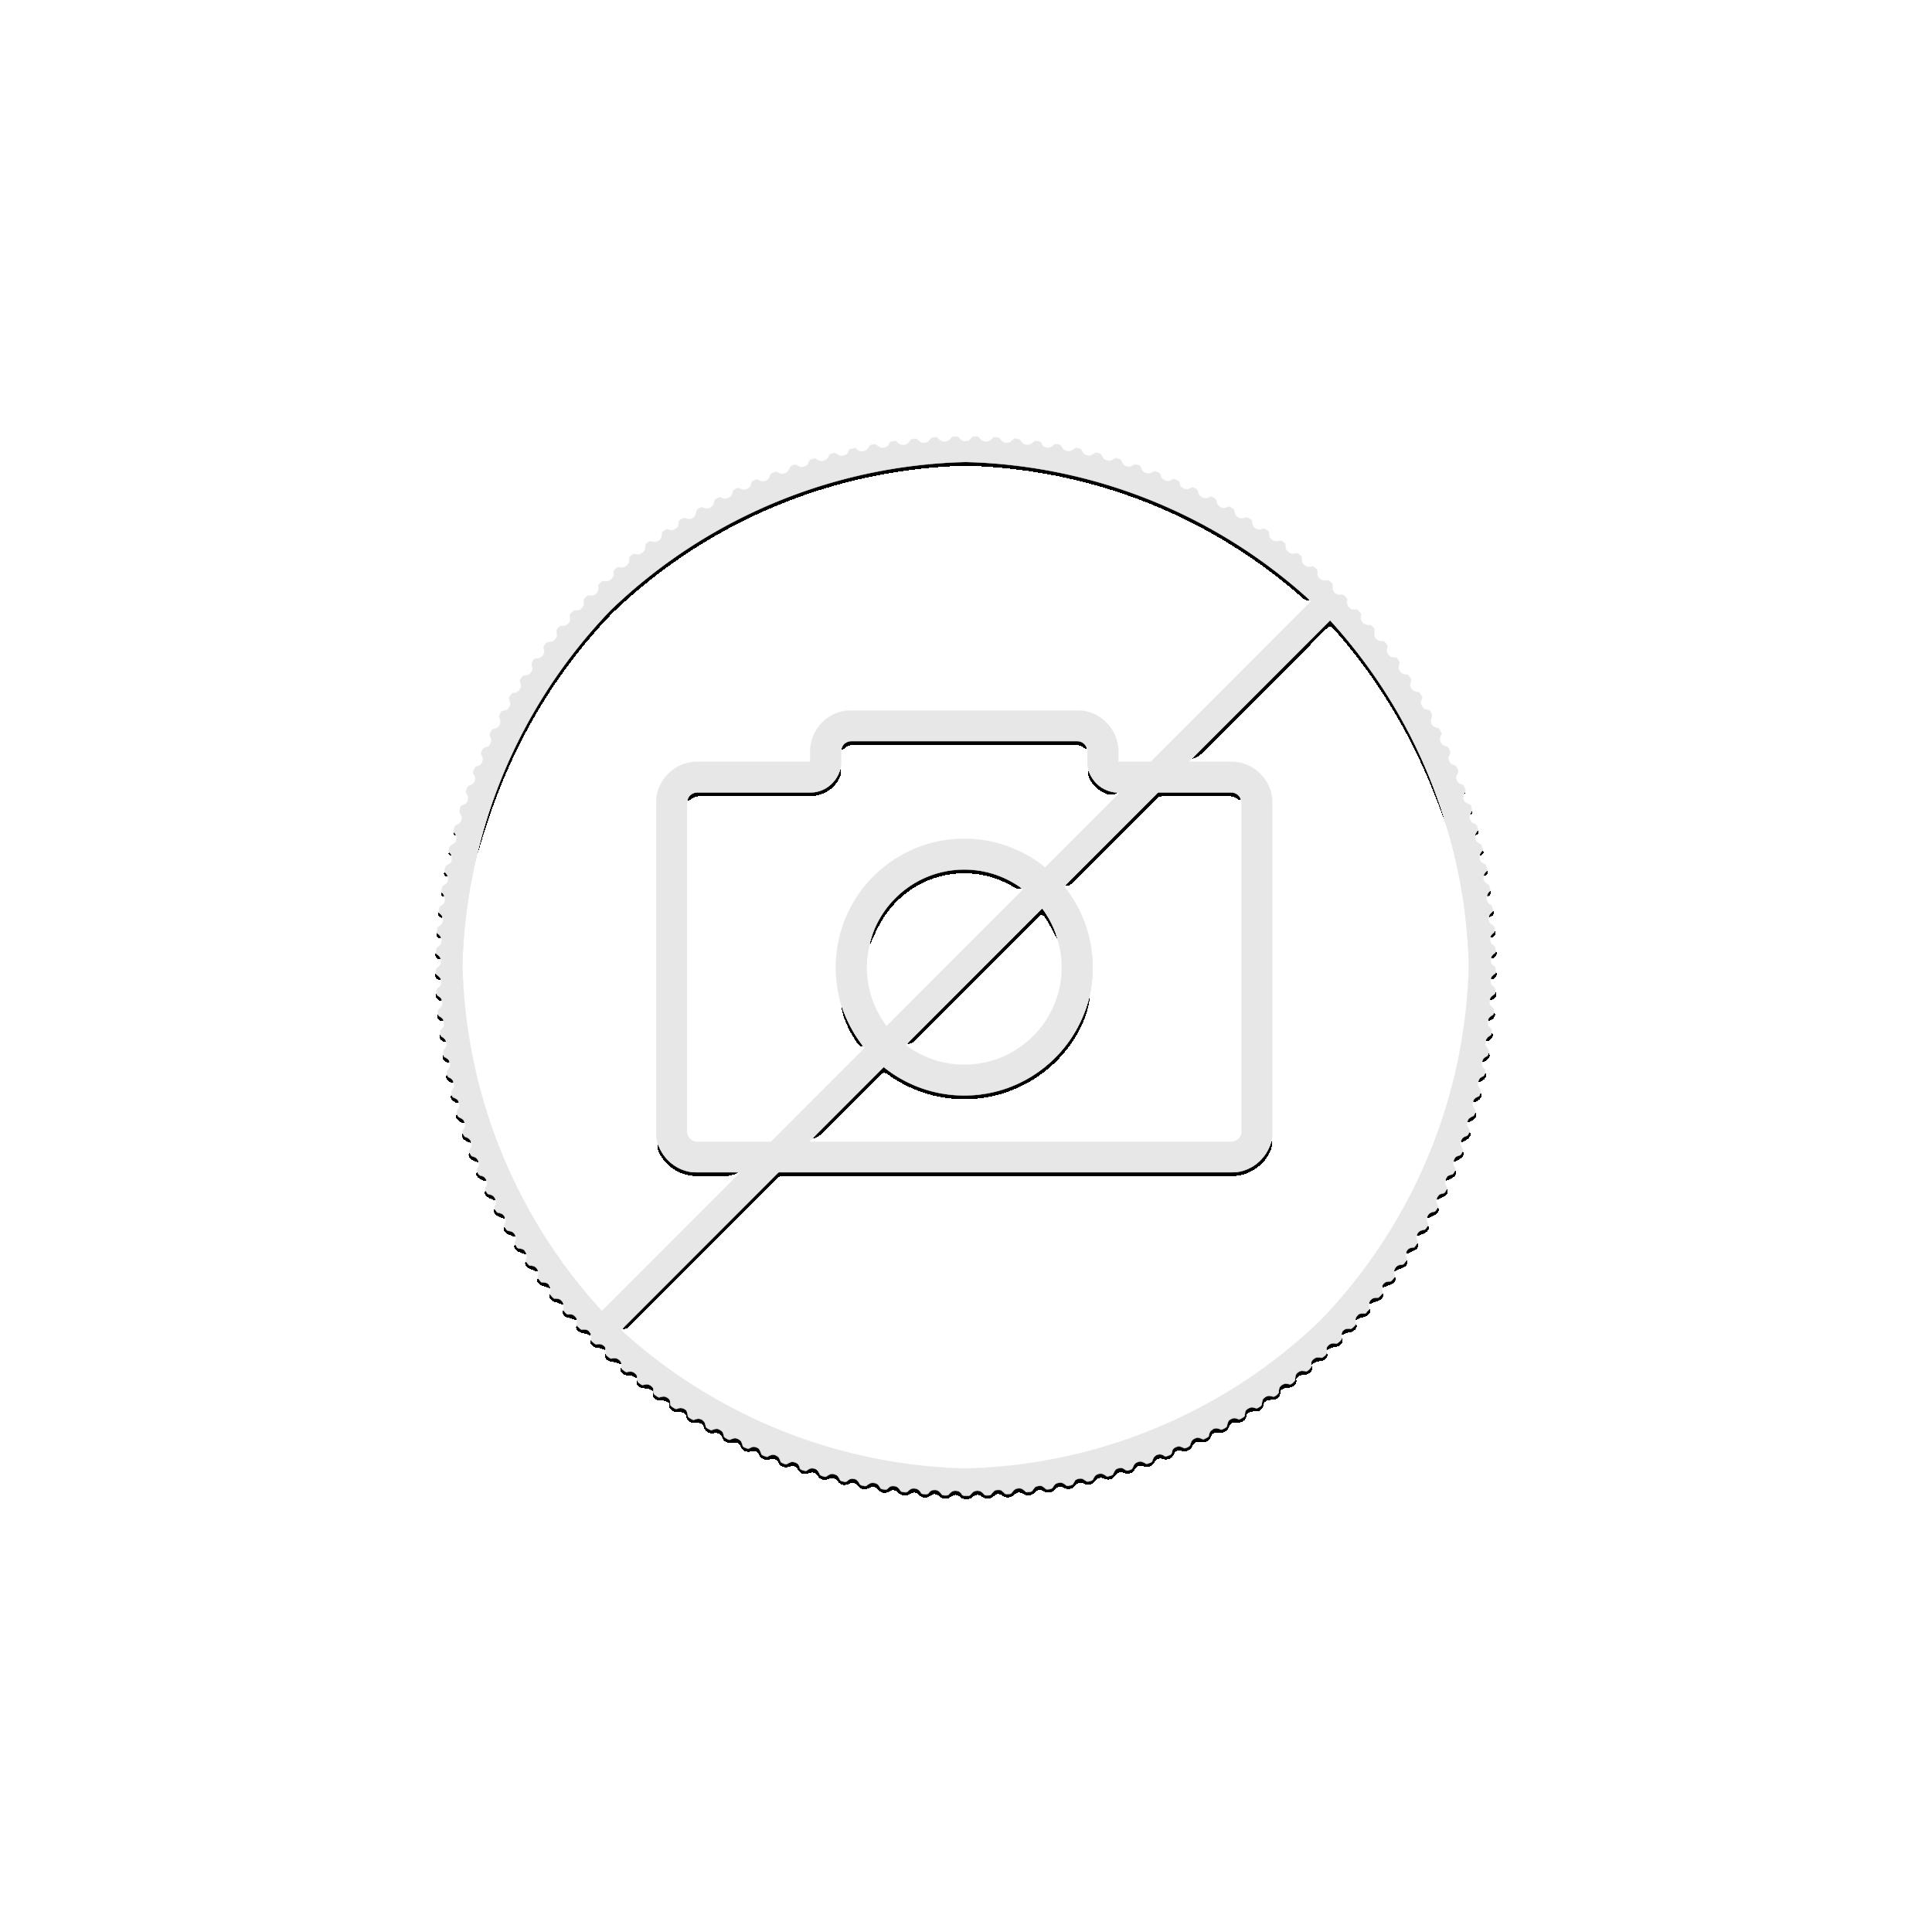 5 Gram goldbar Degussa